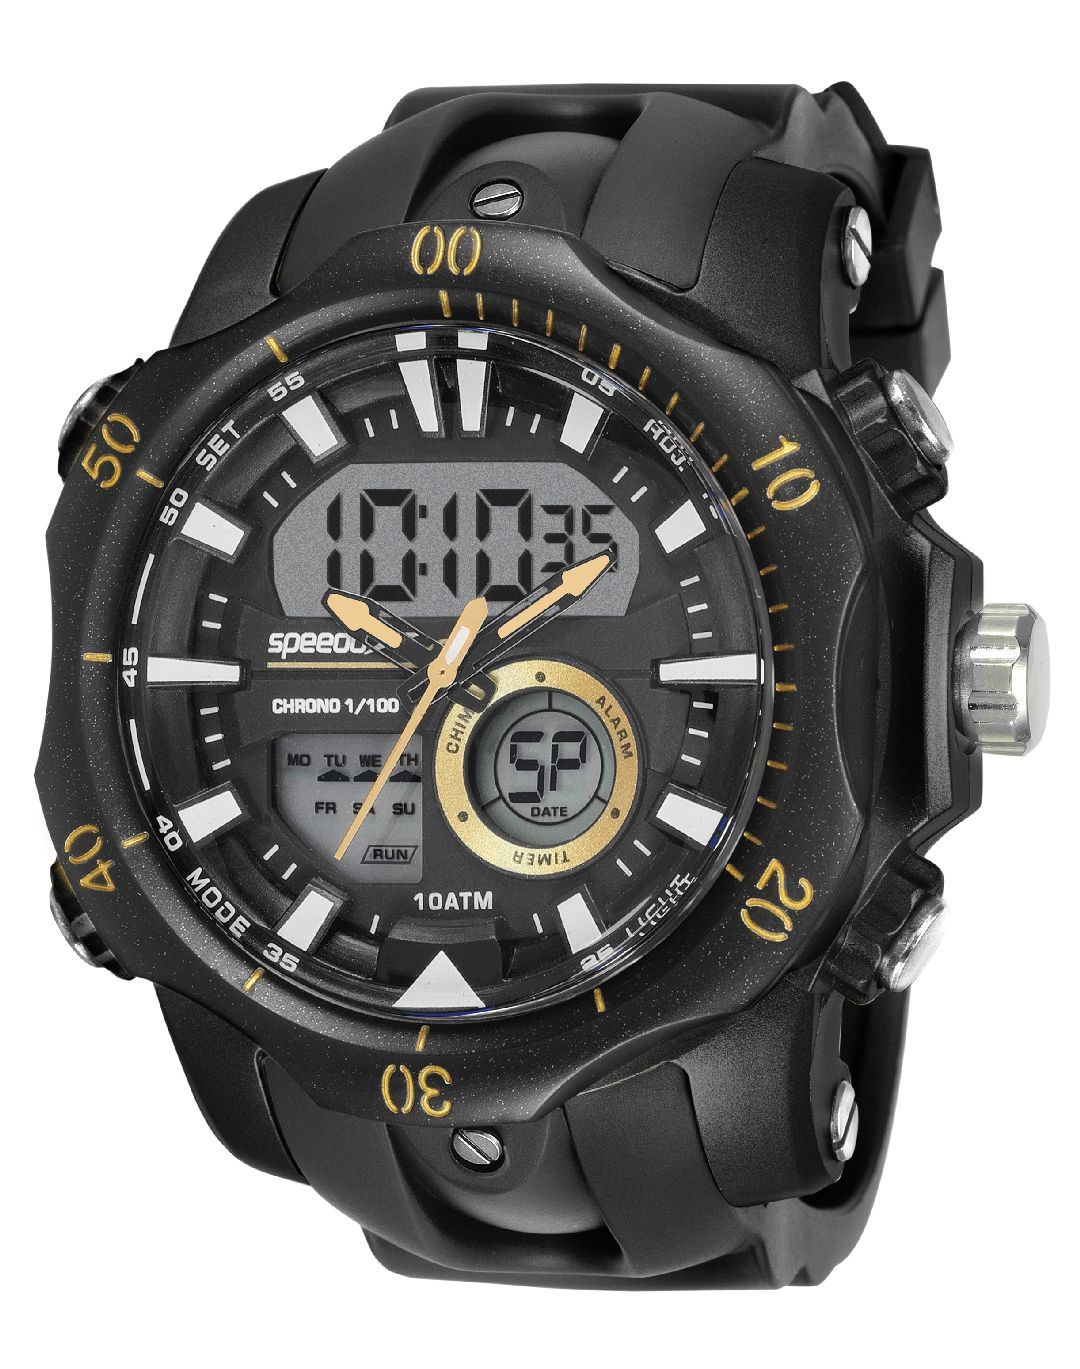 Relógio Masculino Speedo Pulseira de Poliuretano Preta Fundo Preto 11011G0EVNP3